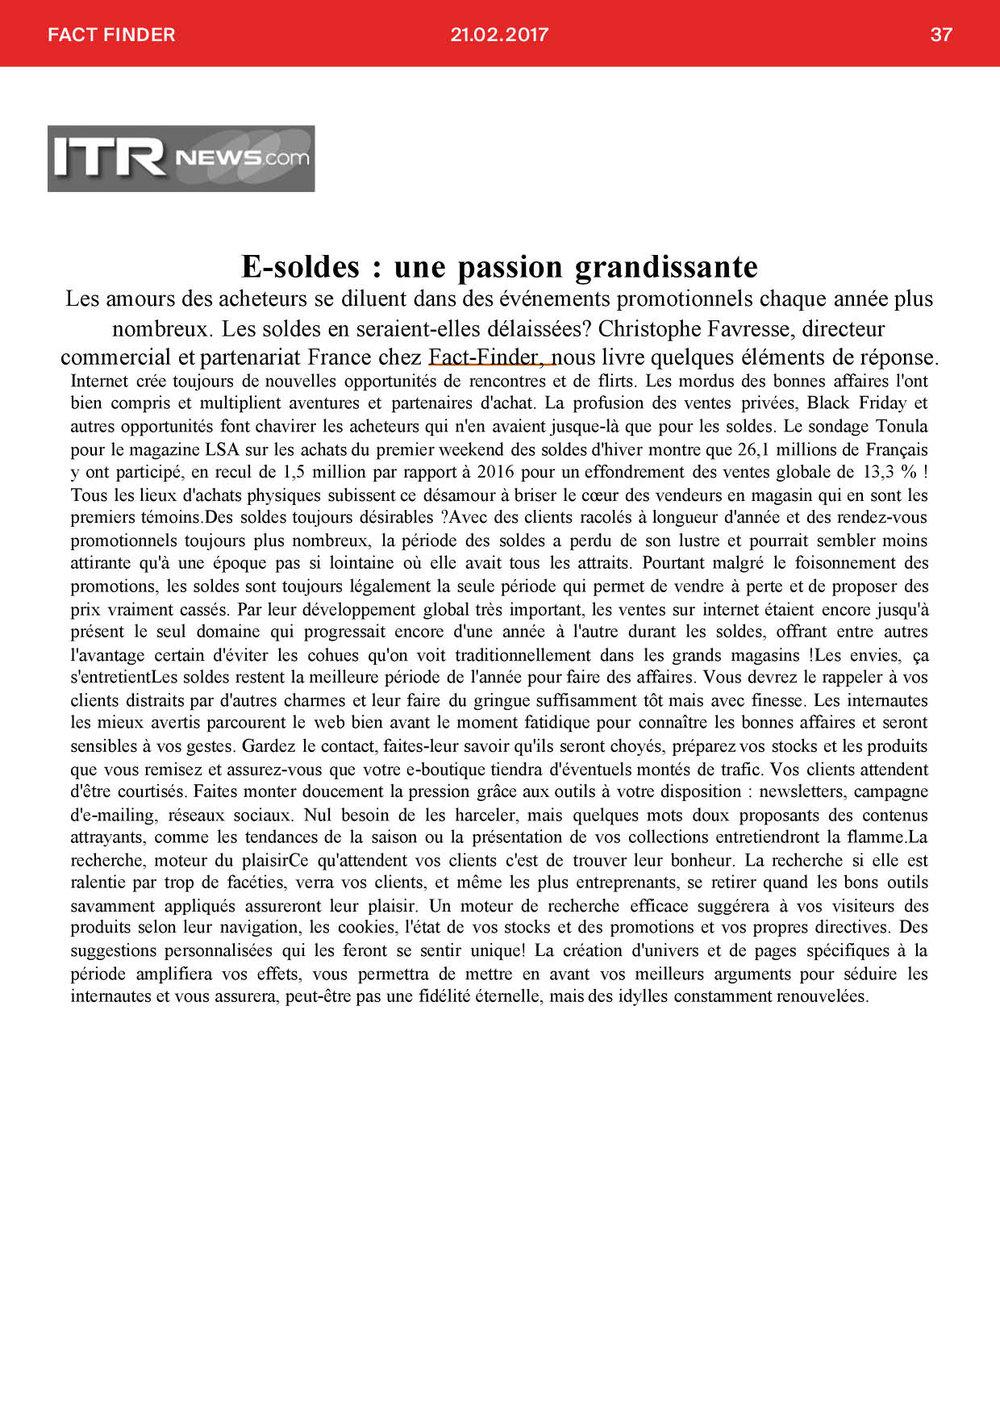 BOOKMEDIA_FEV37.jpg